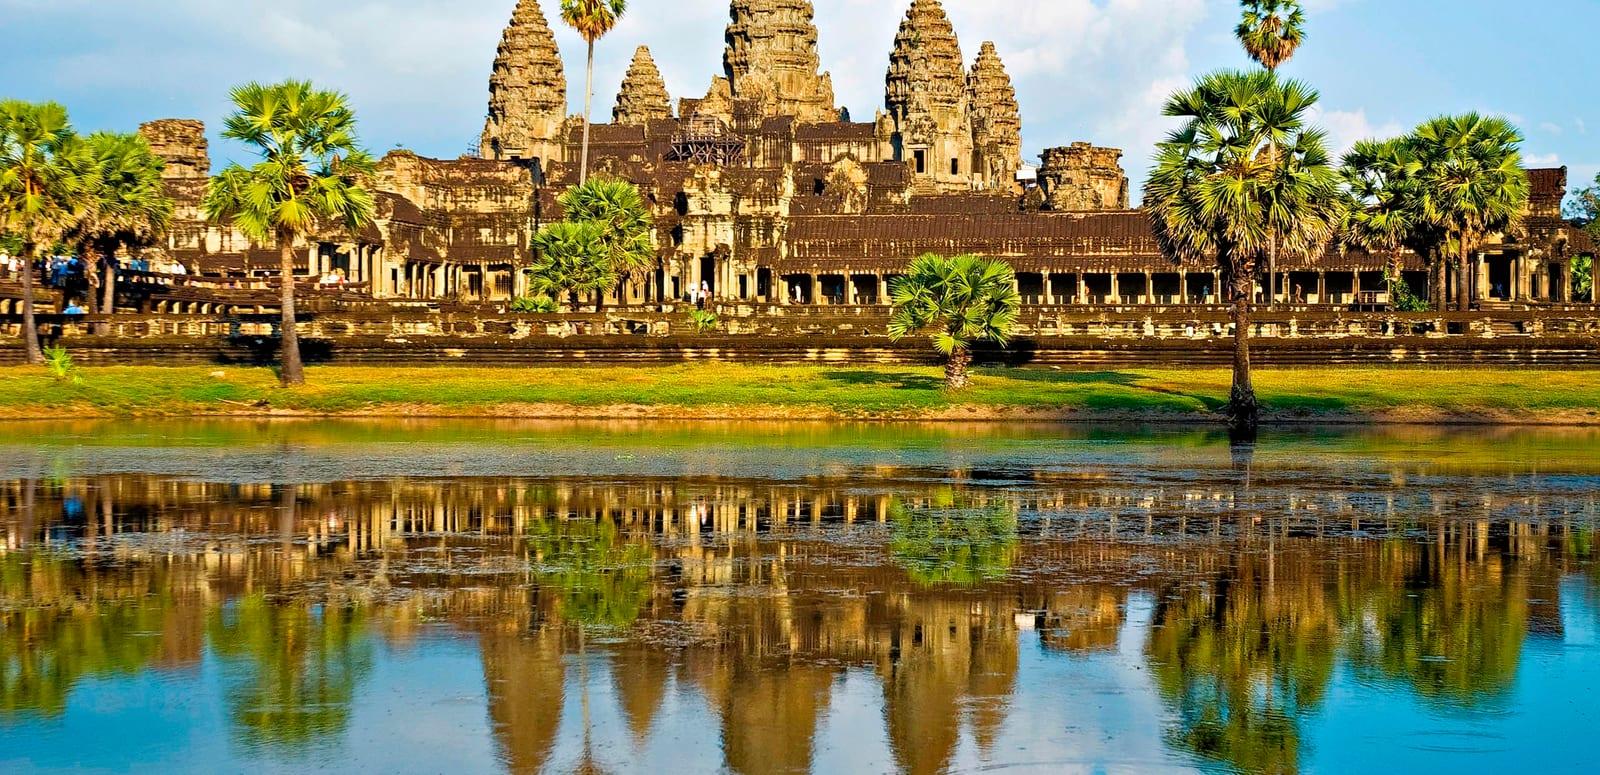 1464188819_20130528081731angkor-wat-wallpaper-cambodia.jpg